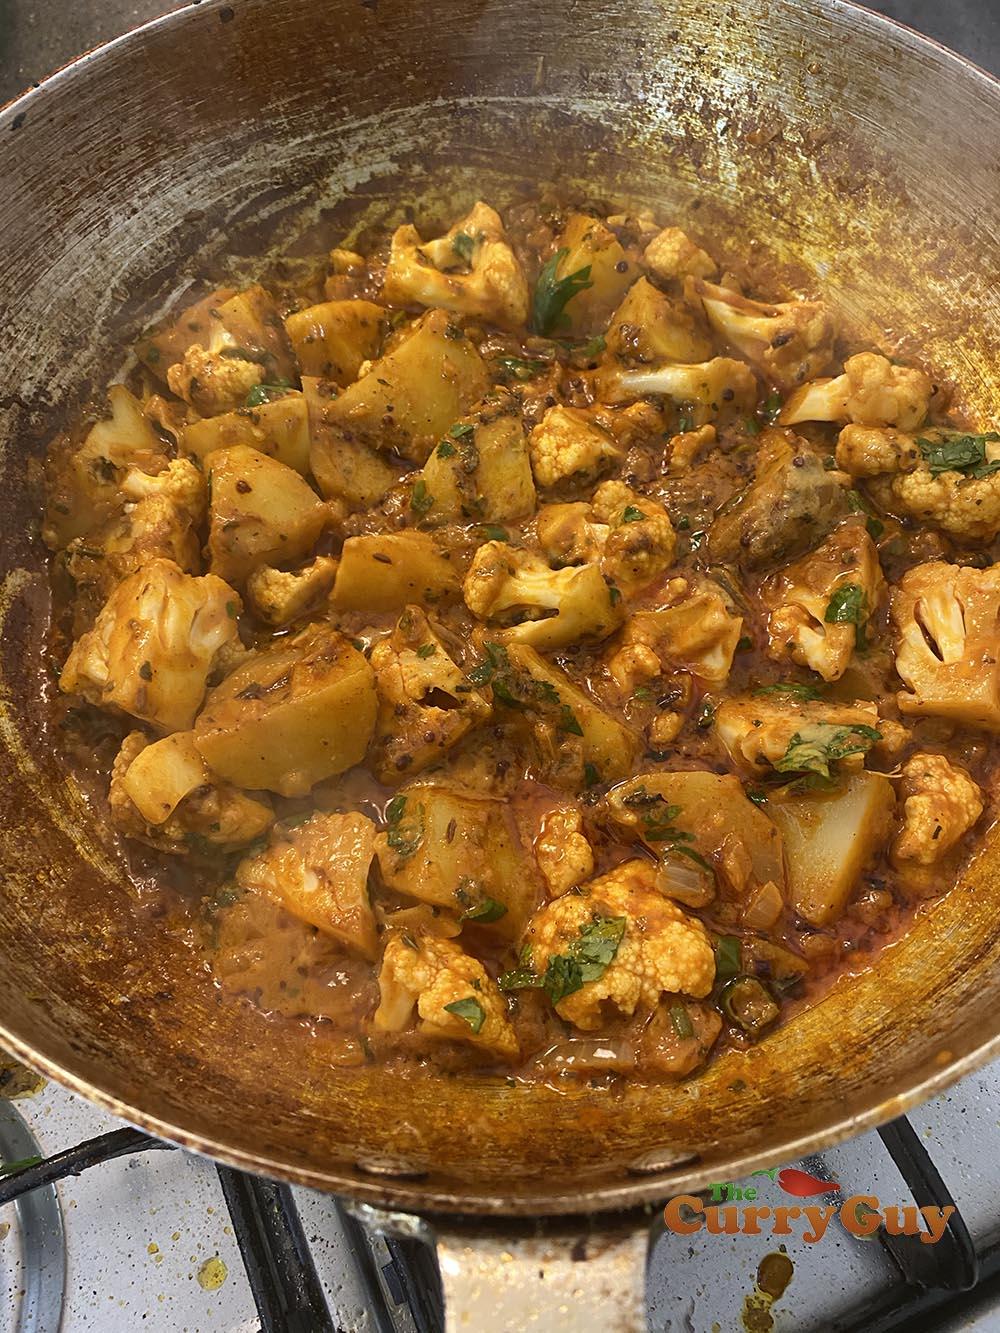 Cooked aloo gobi